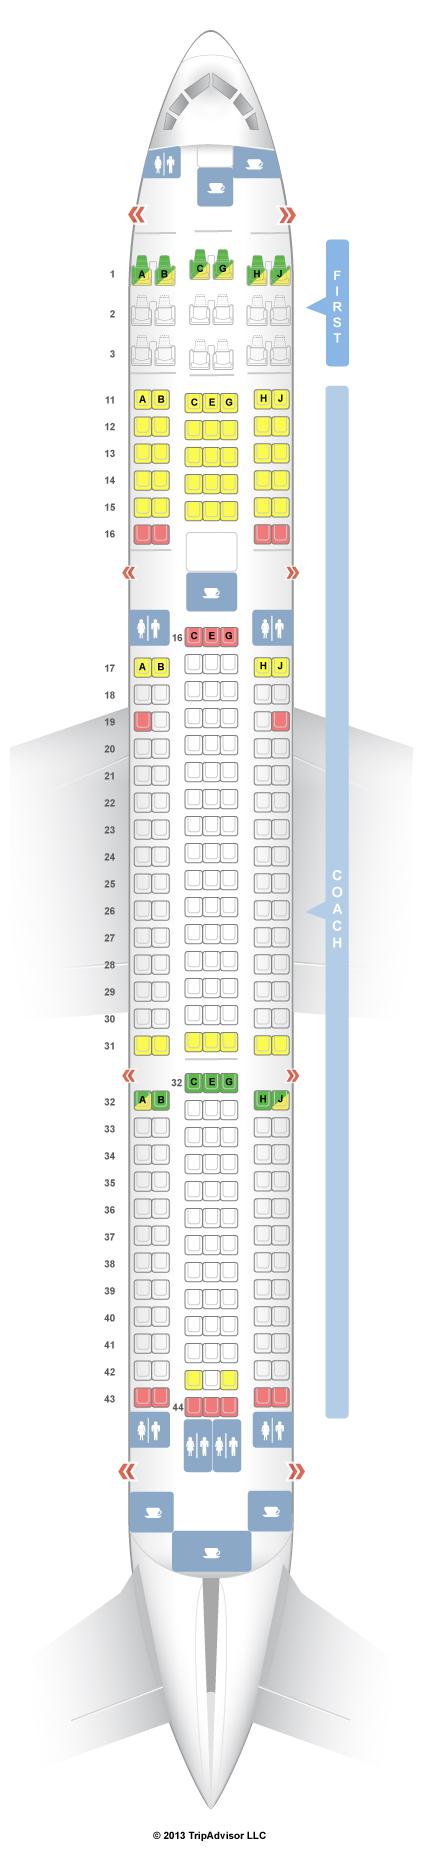 seatguru seat map hawaiian airlines boeing 767 300er 763 v1